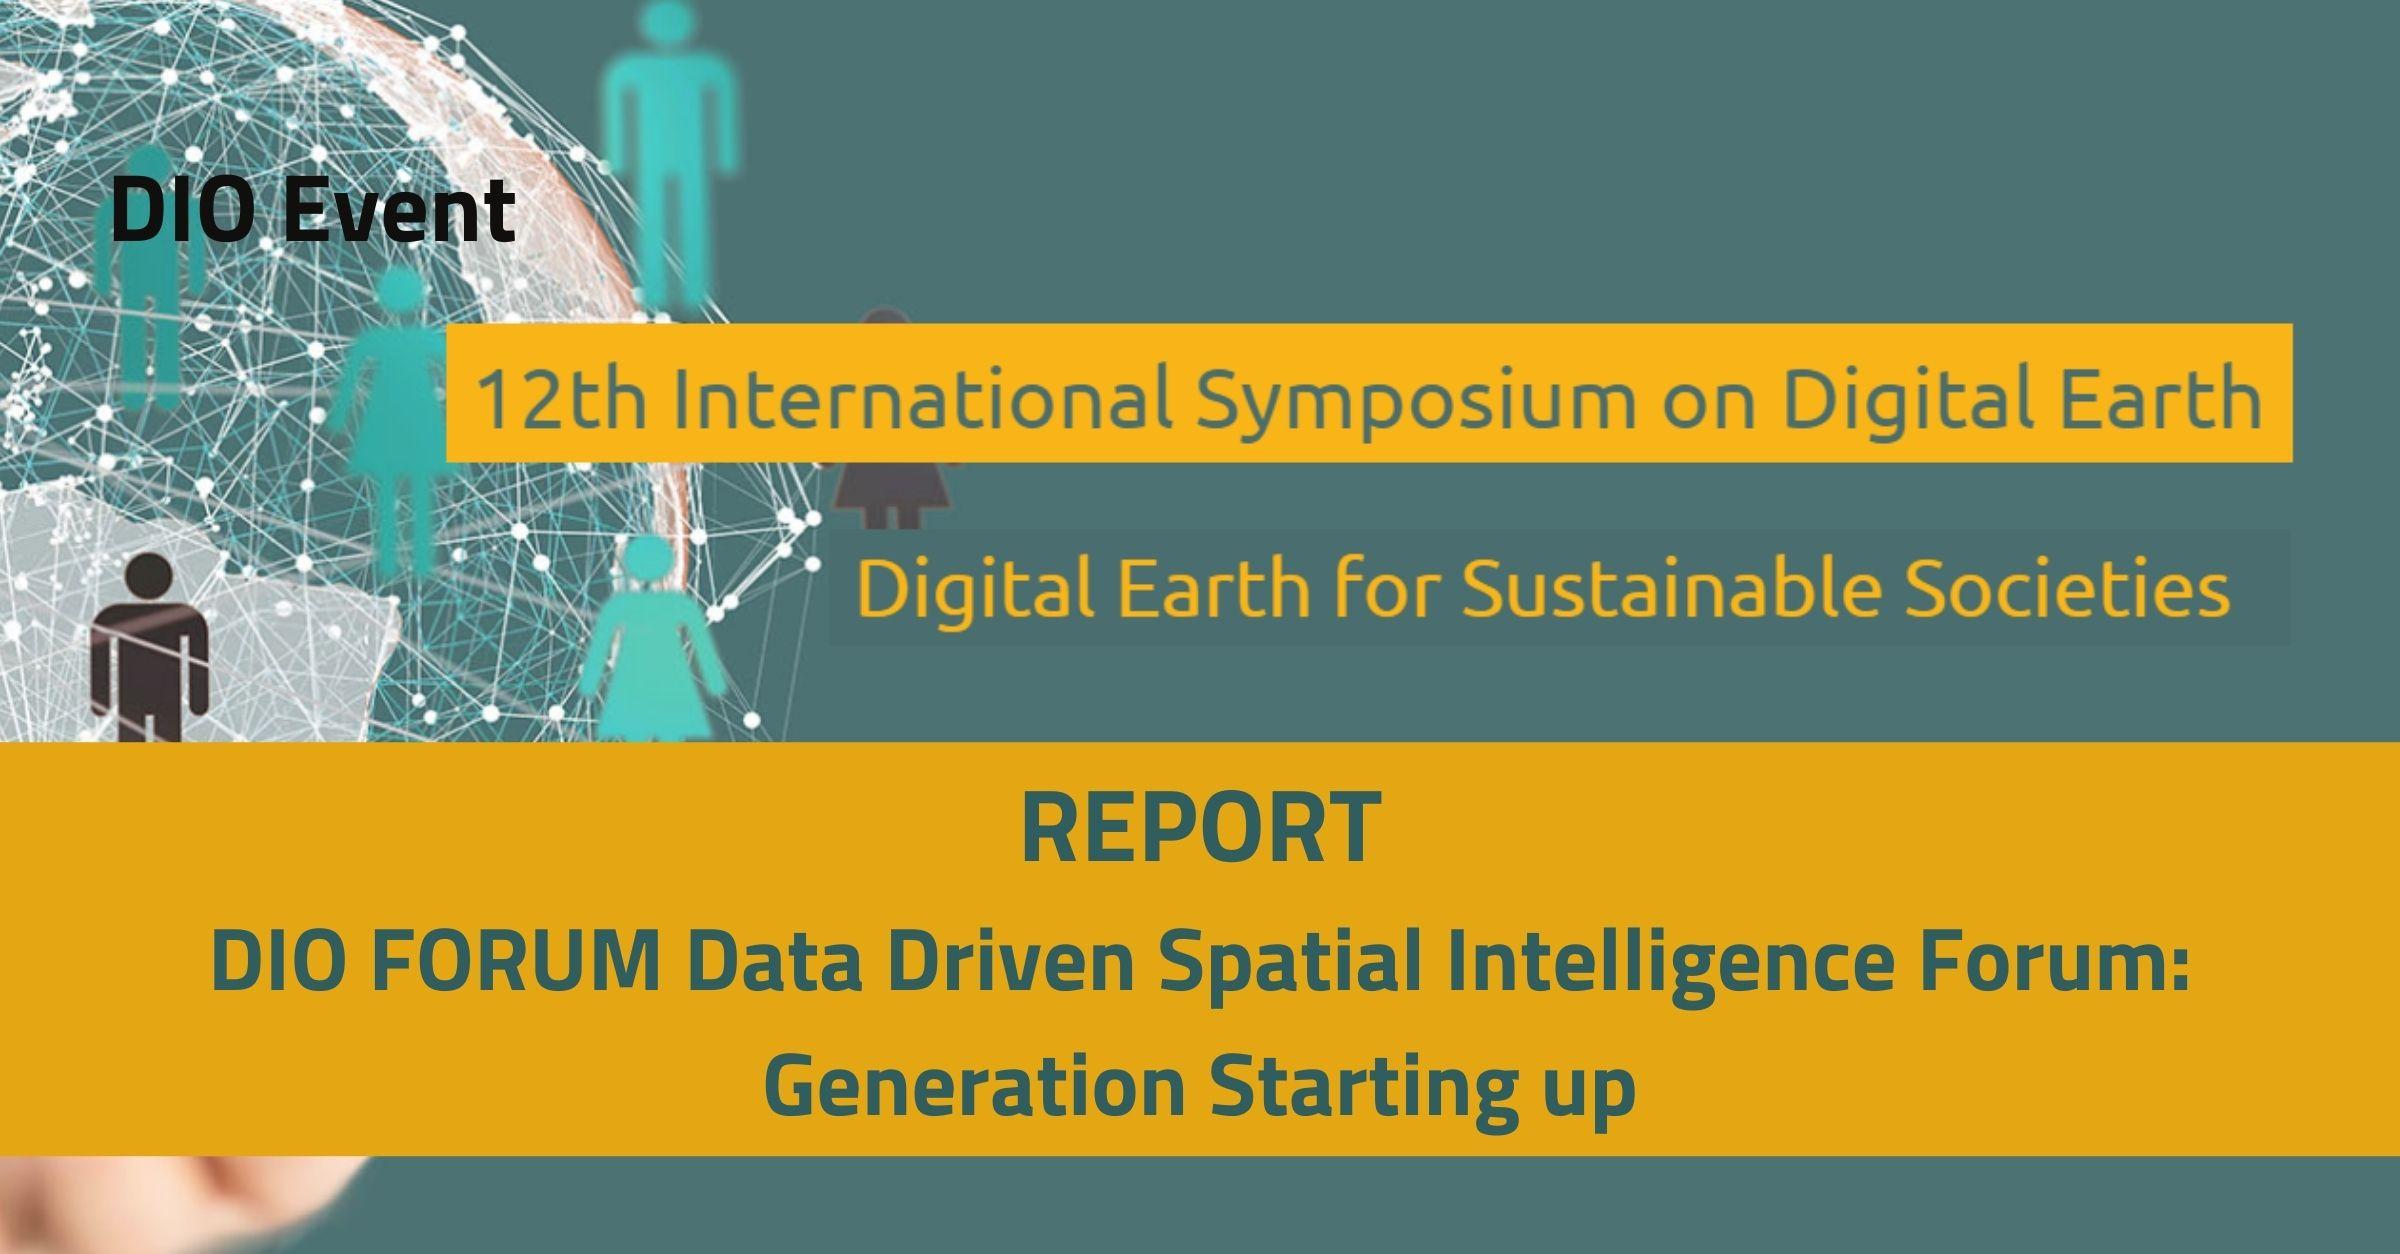 Data Driven Spatial Intelligence Forum: Generation Starting Up